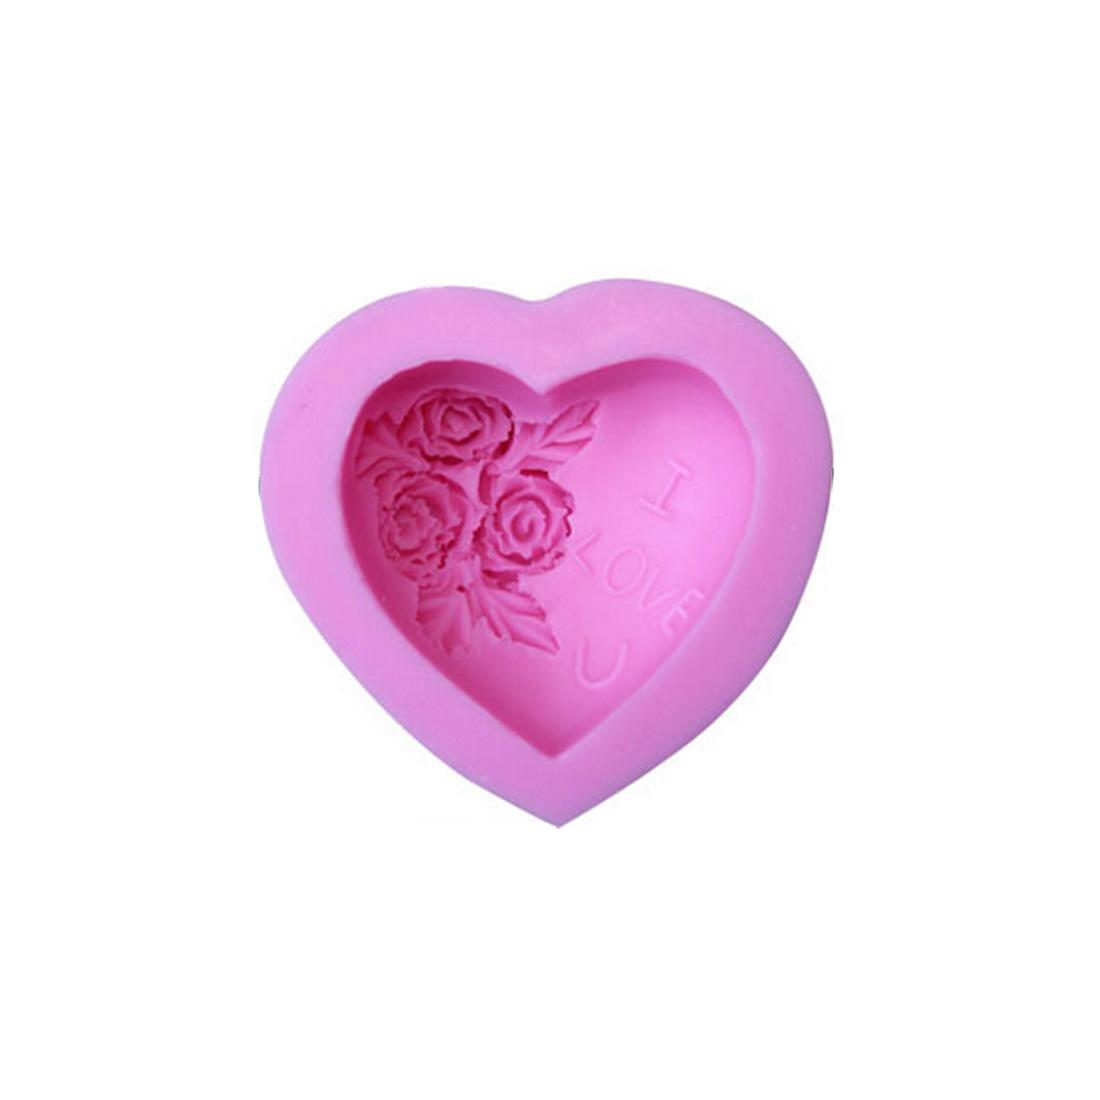 Random Loving Heart Rose Flower Silicone Soap Mold Cake Decorating Sugarcraft Cupcake 3D Mould New(China (Mainland))